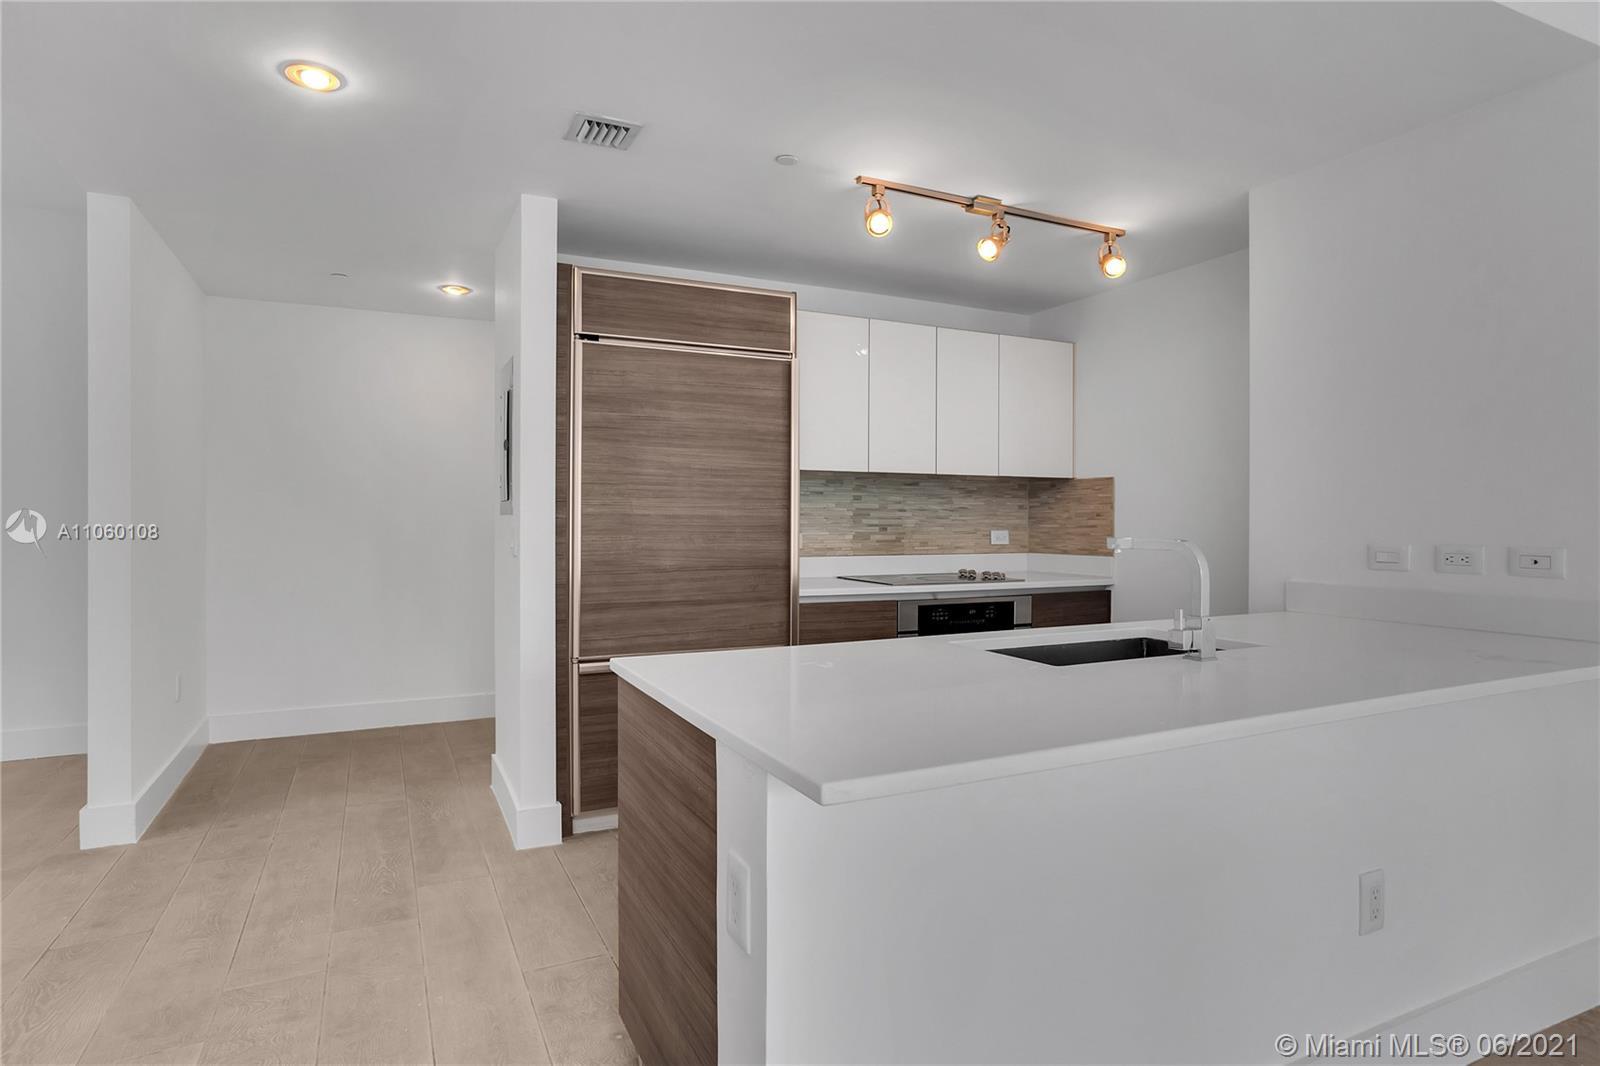 1100 Millecento #1702 - 1100 S Miami Ave #1702, Miami, FL 33130